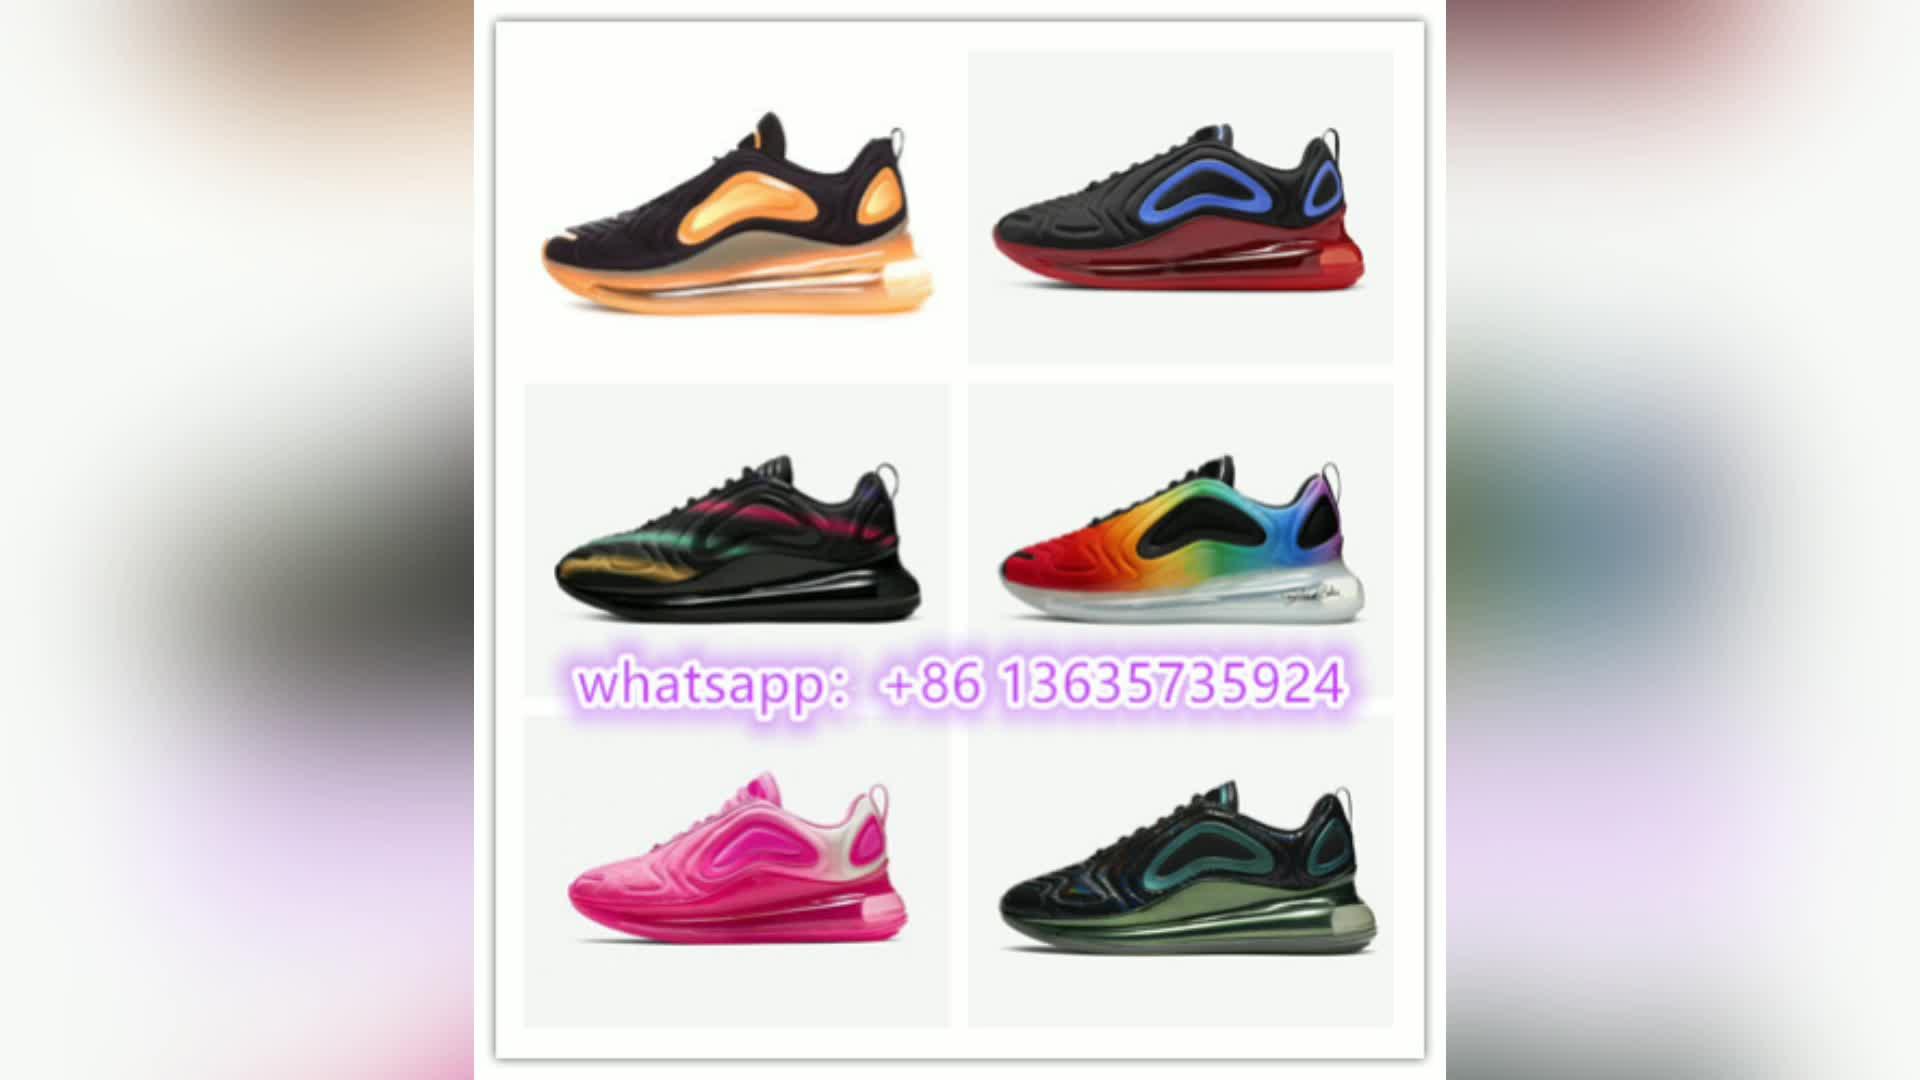 Murah 2020 dan 2021 TN Fashion 97 Sepatu Lari Baru PRESTO Wanita 87 dan 95 Air Sepatu Lari 90 Pria Sepatu Lari